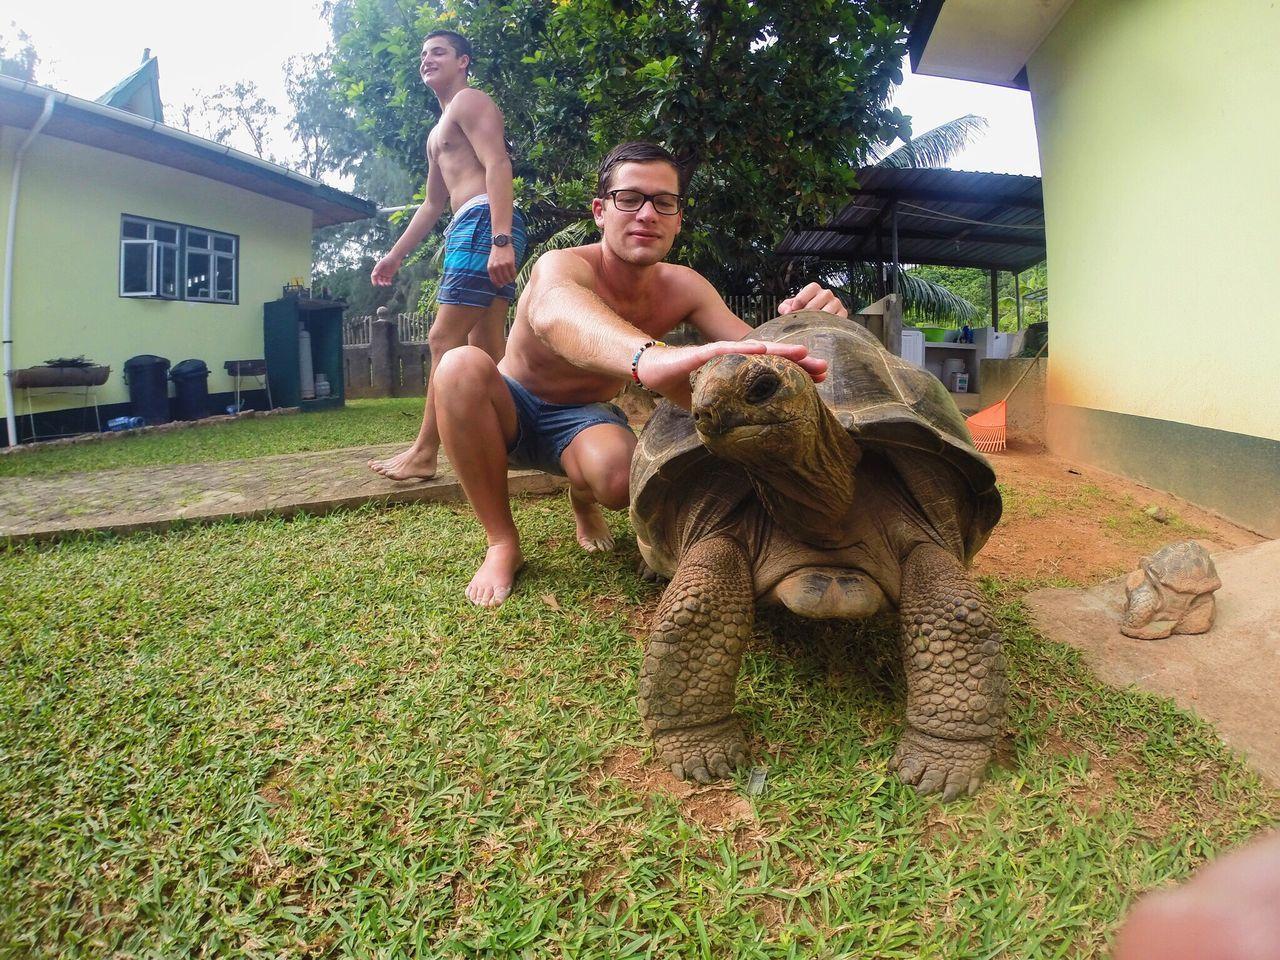 Exploring the islands of seychelles Seychelles Island Vacation Summer Giant Tortoise Tortoise BIG